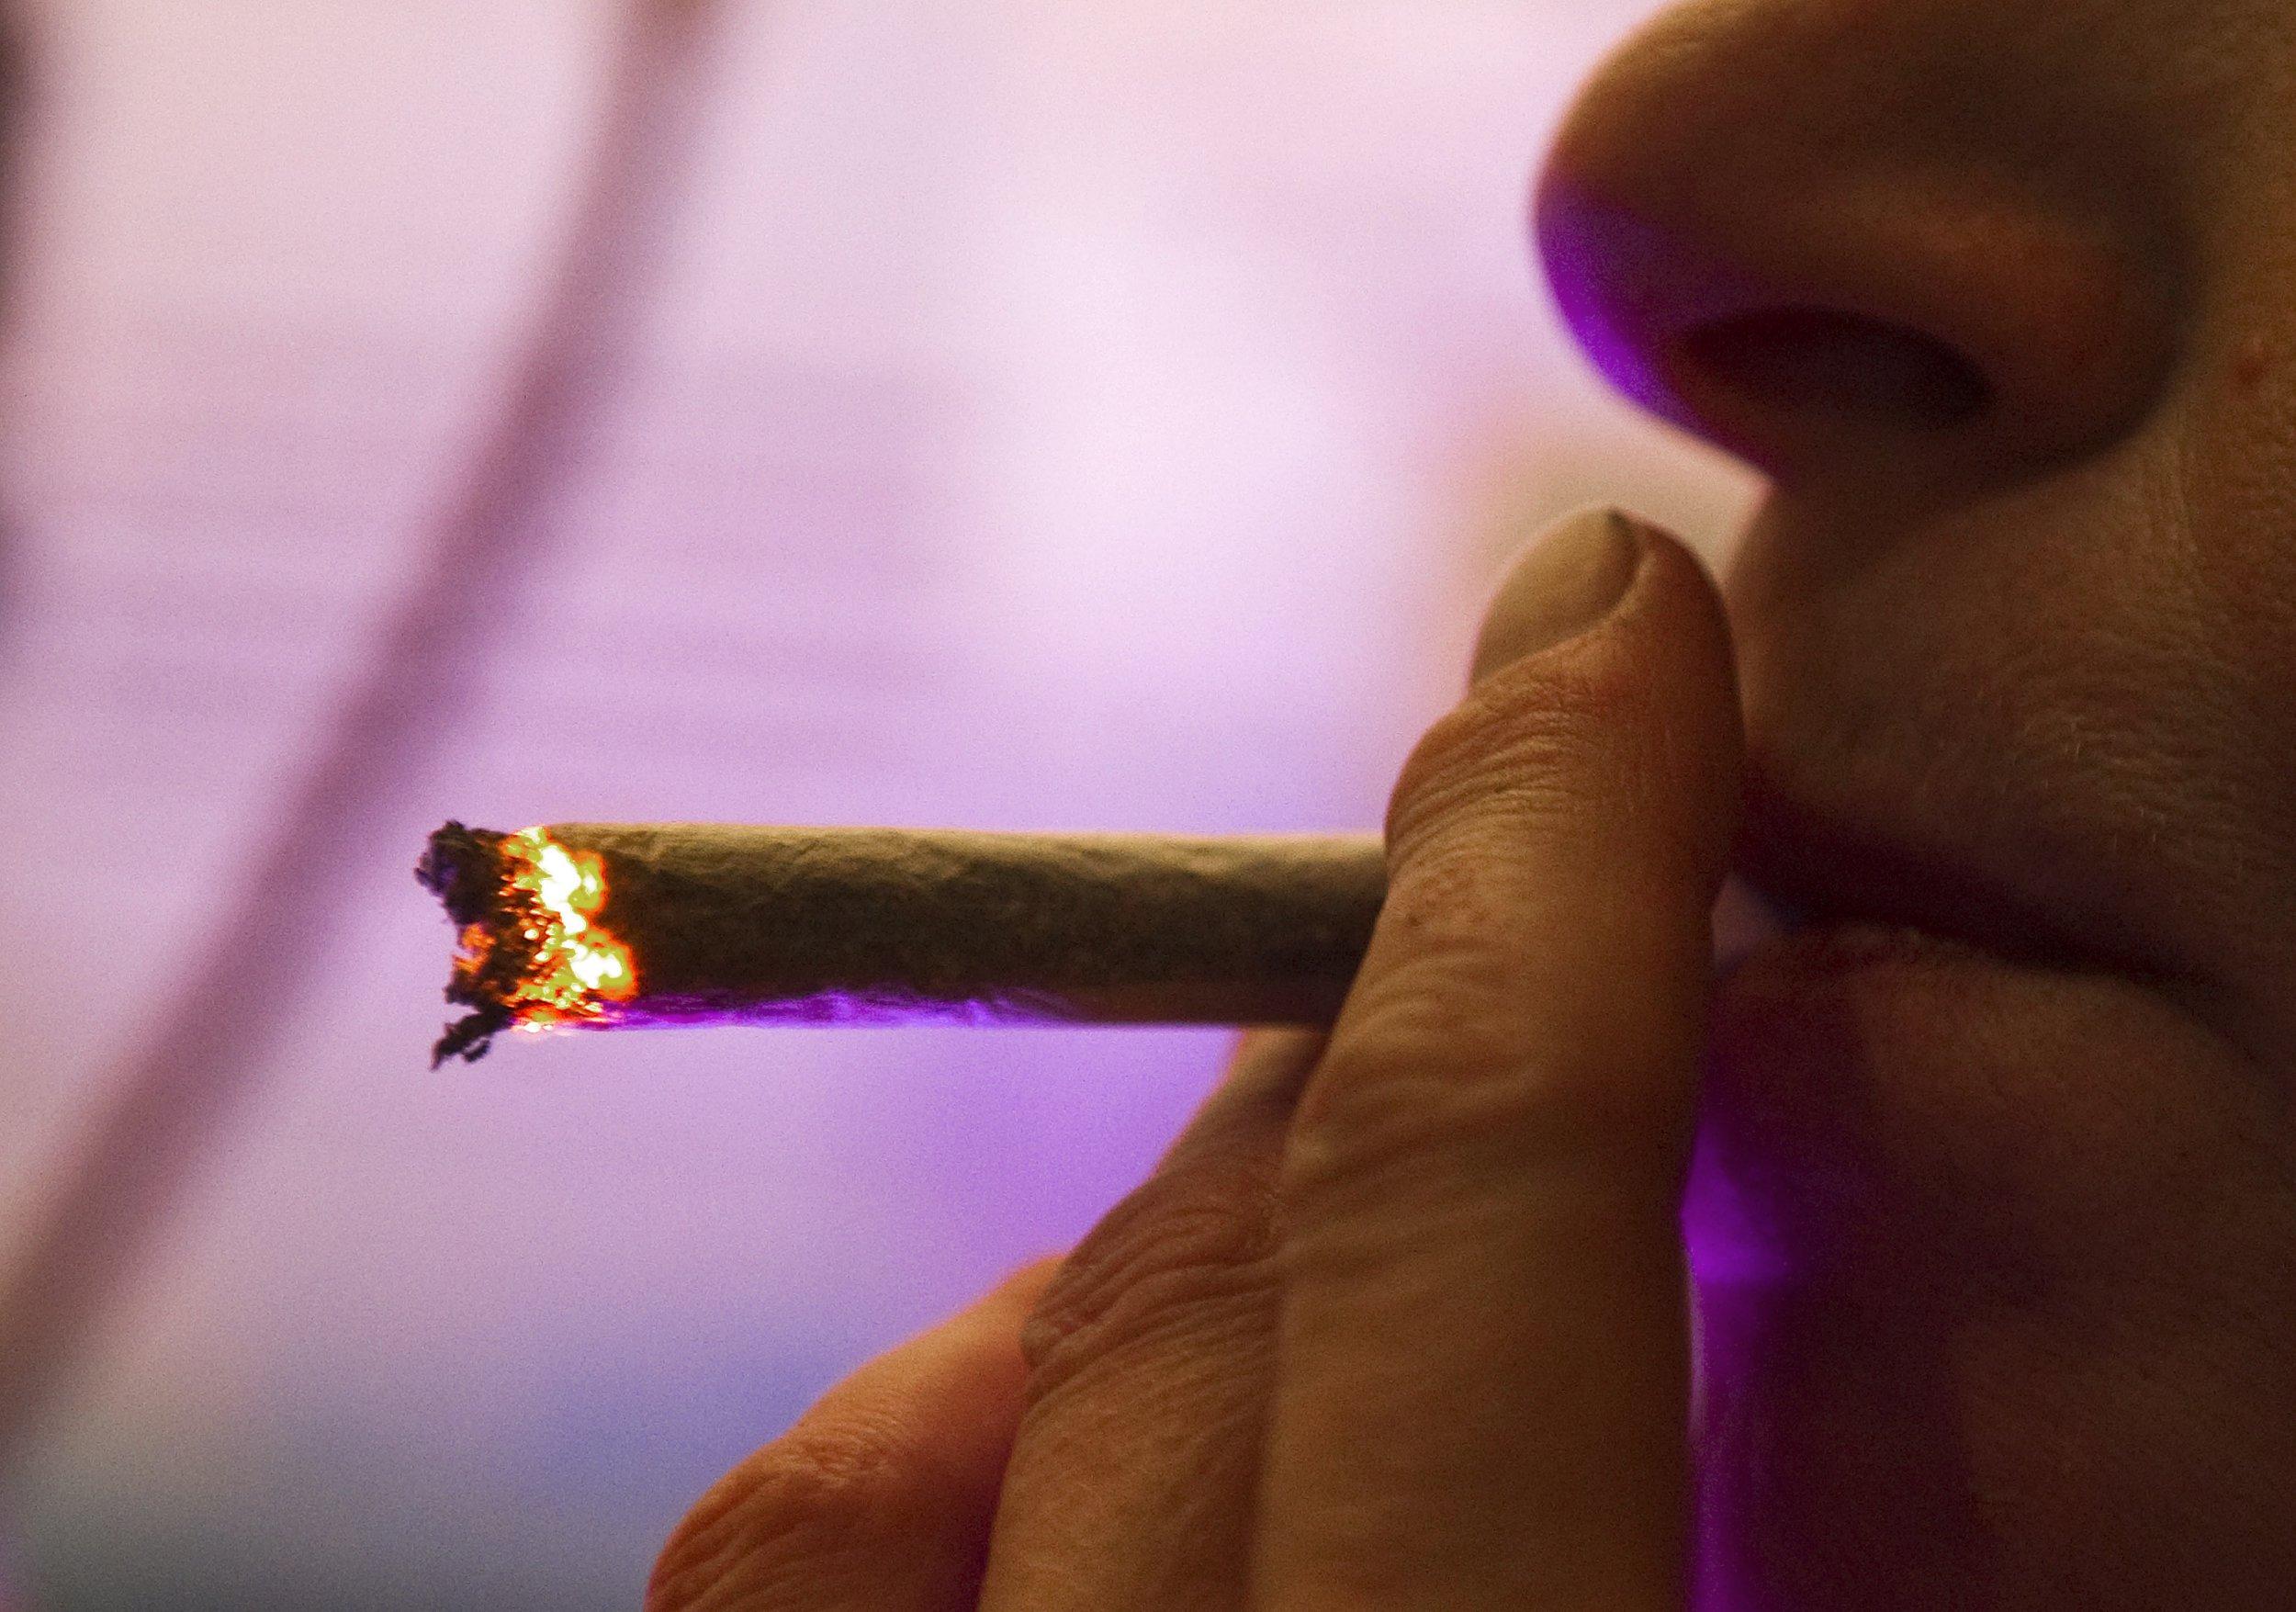 Smoking skunk could make men infertile, new study warns